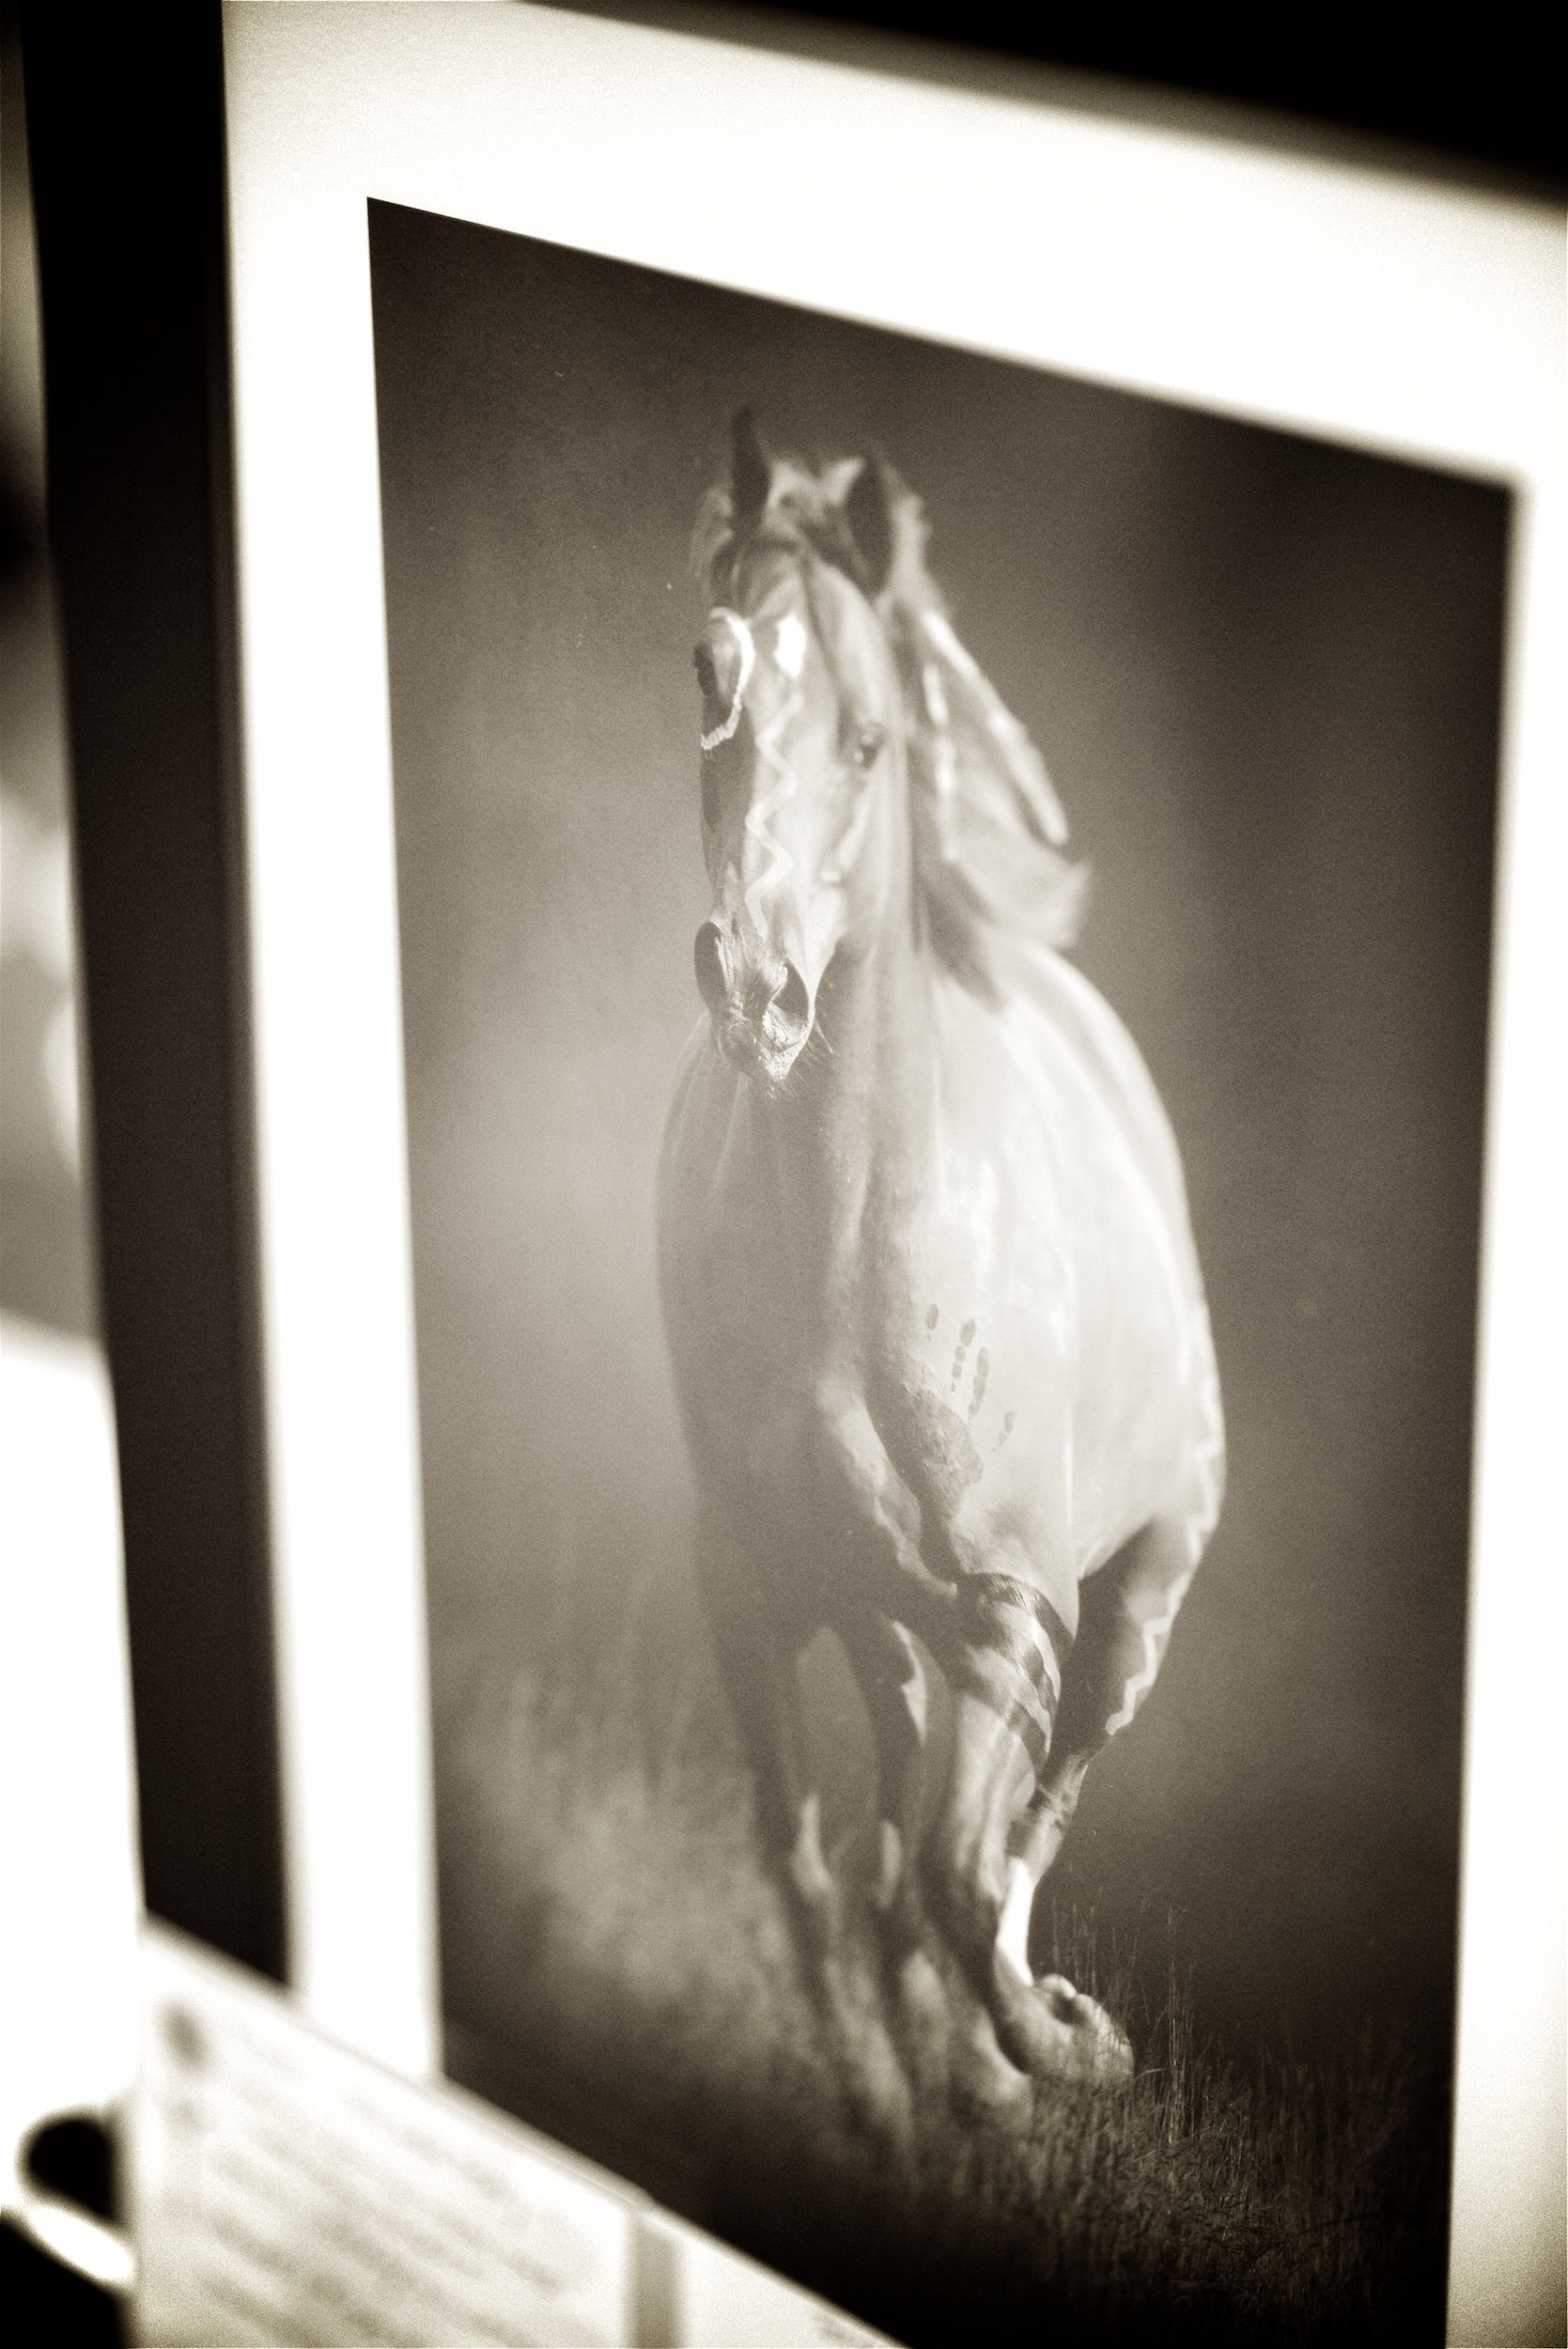 Anthony David Mesler Photography